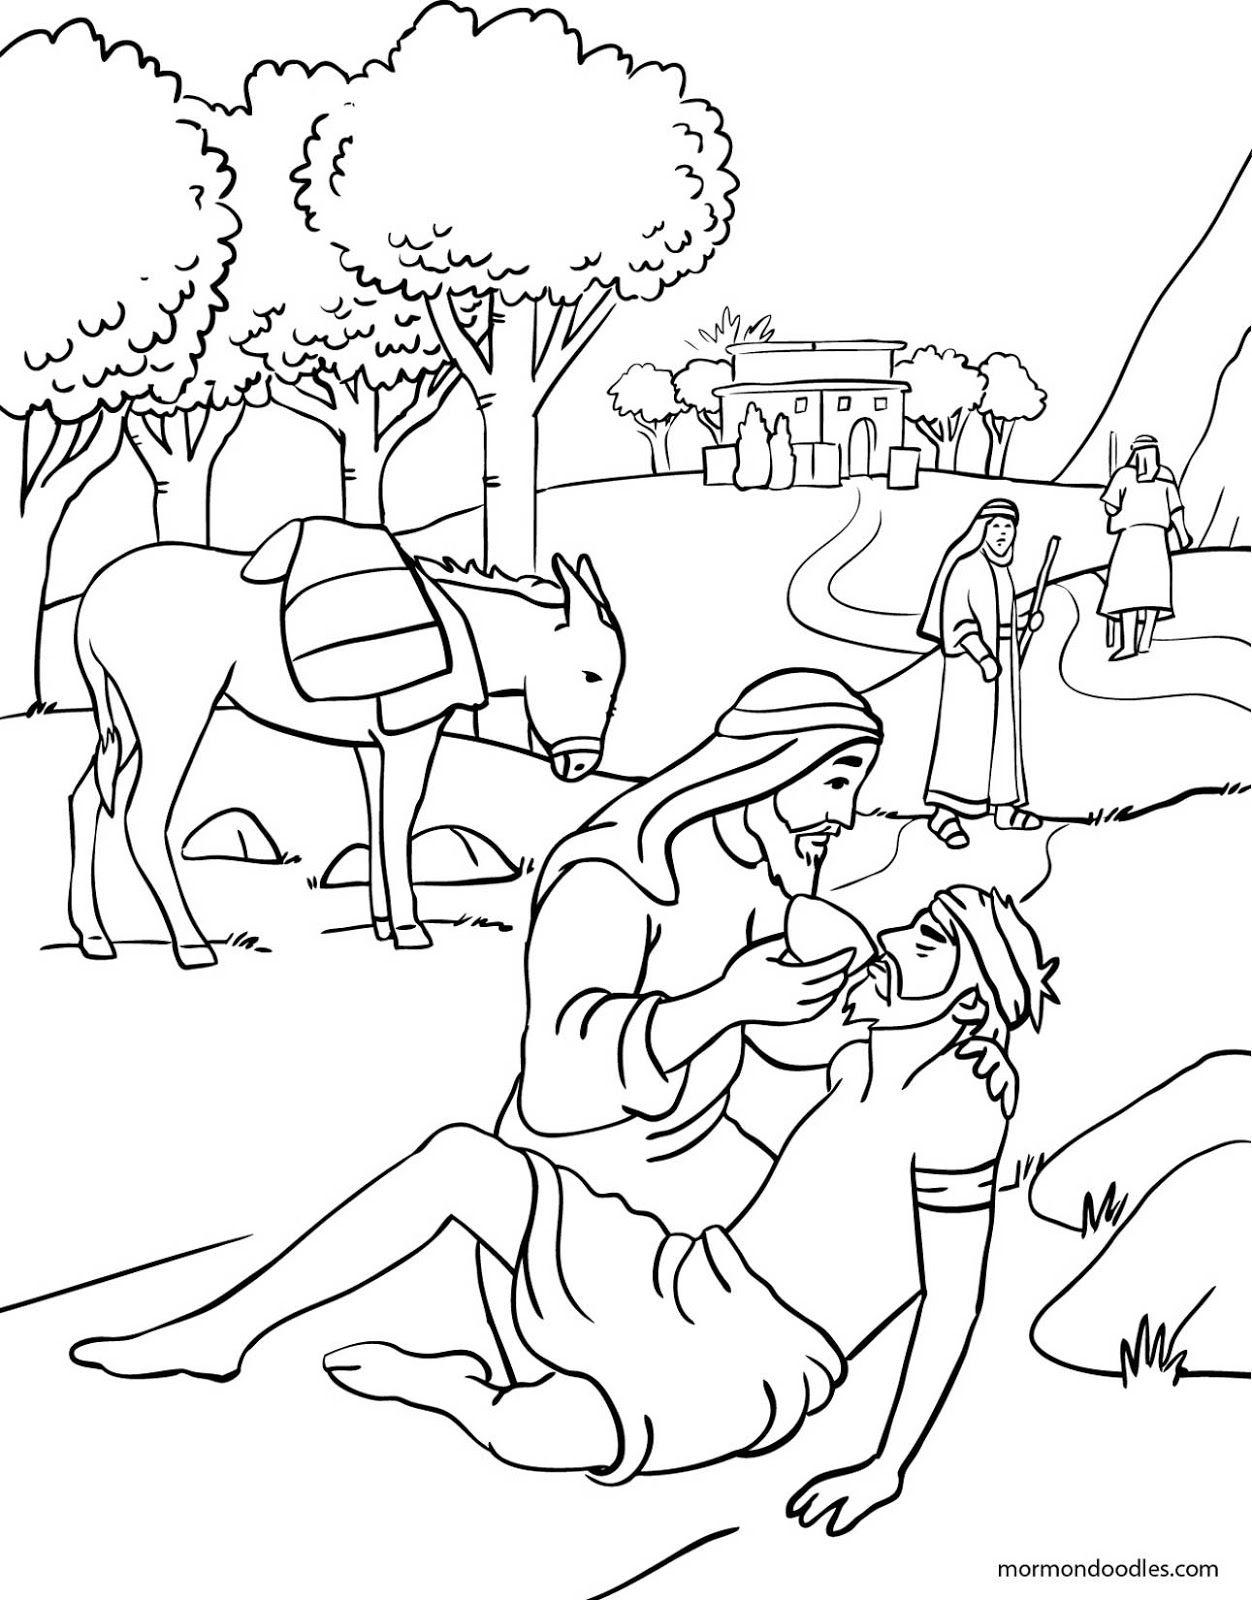 Mormon Doodles The Good Samaritan Coloring Page